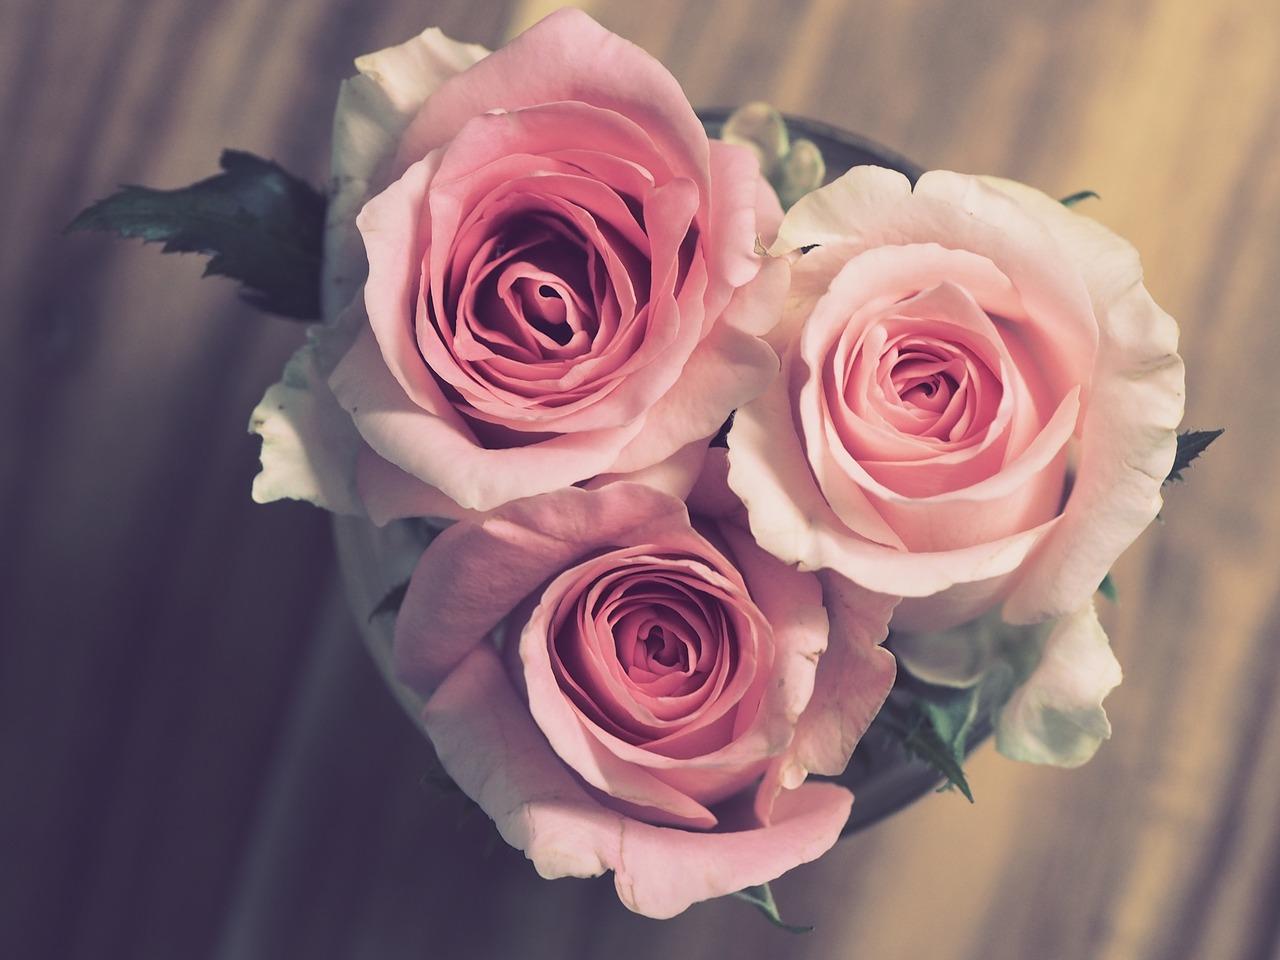 rose-3072698_1280.jpg